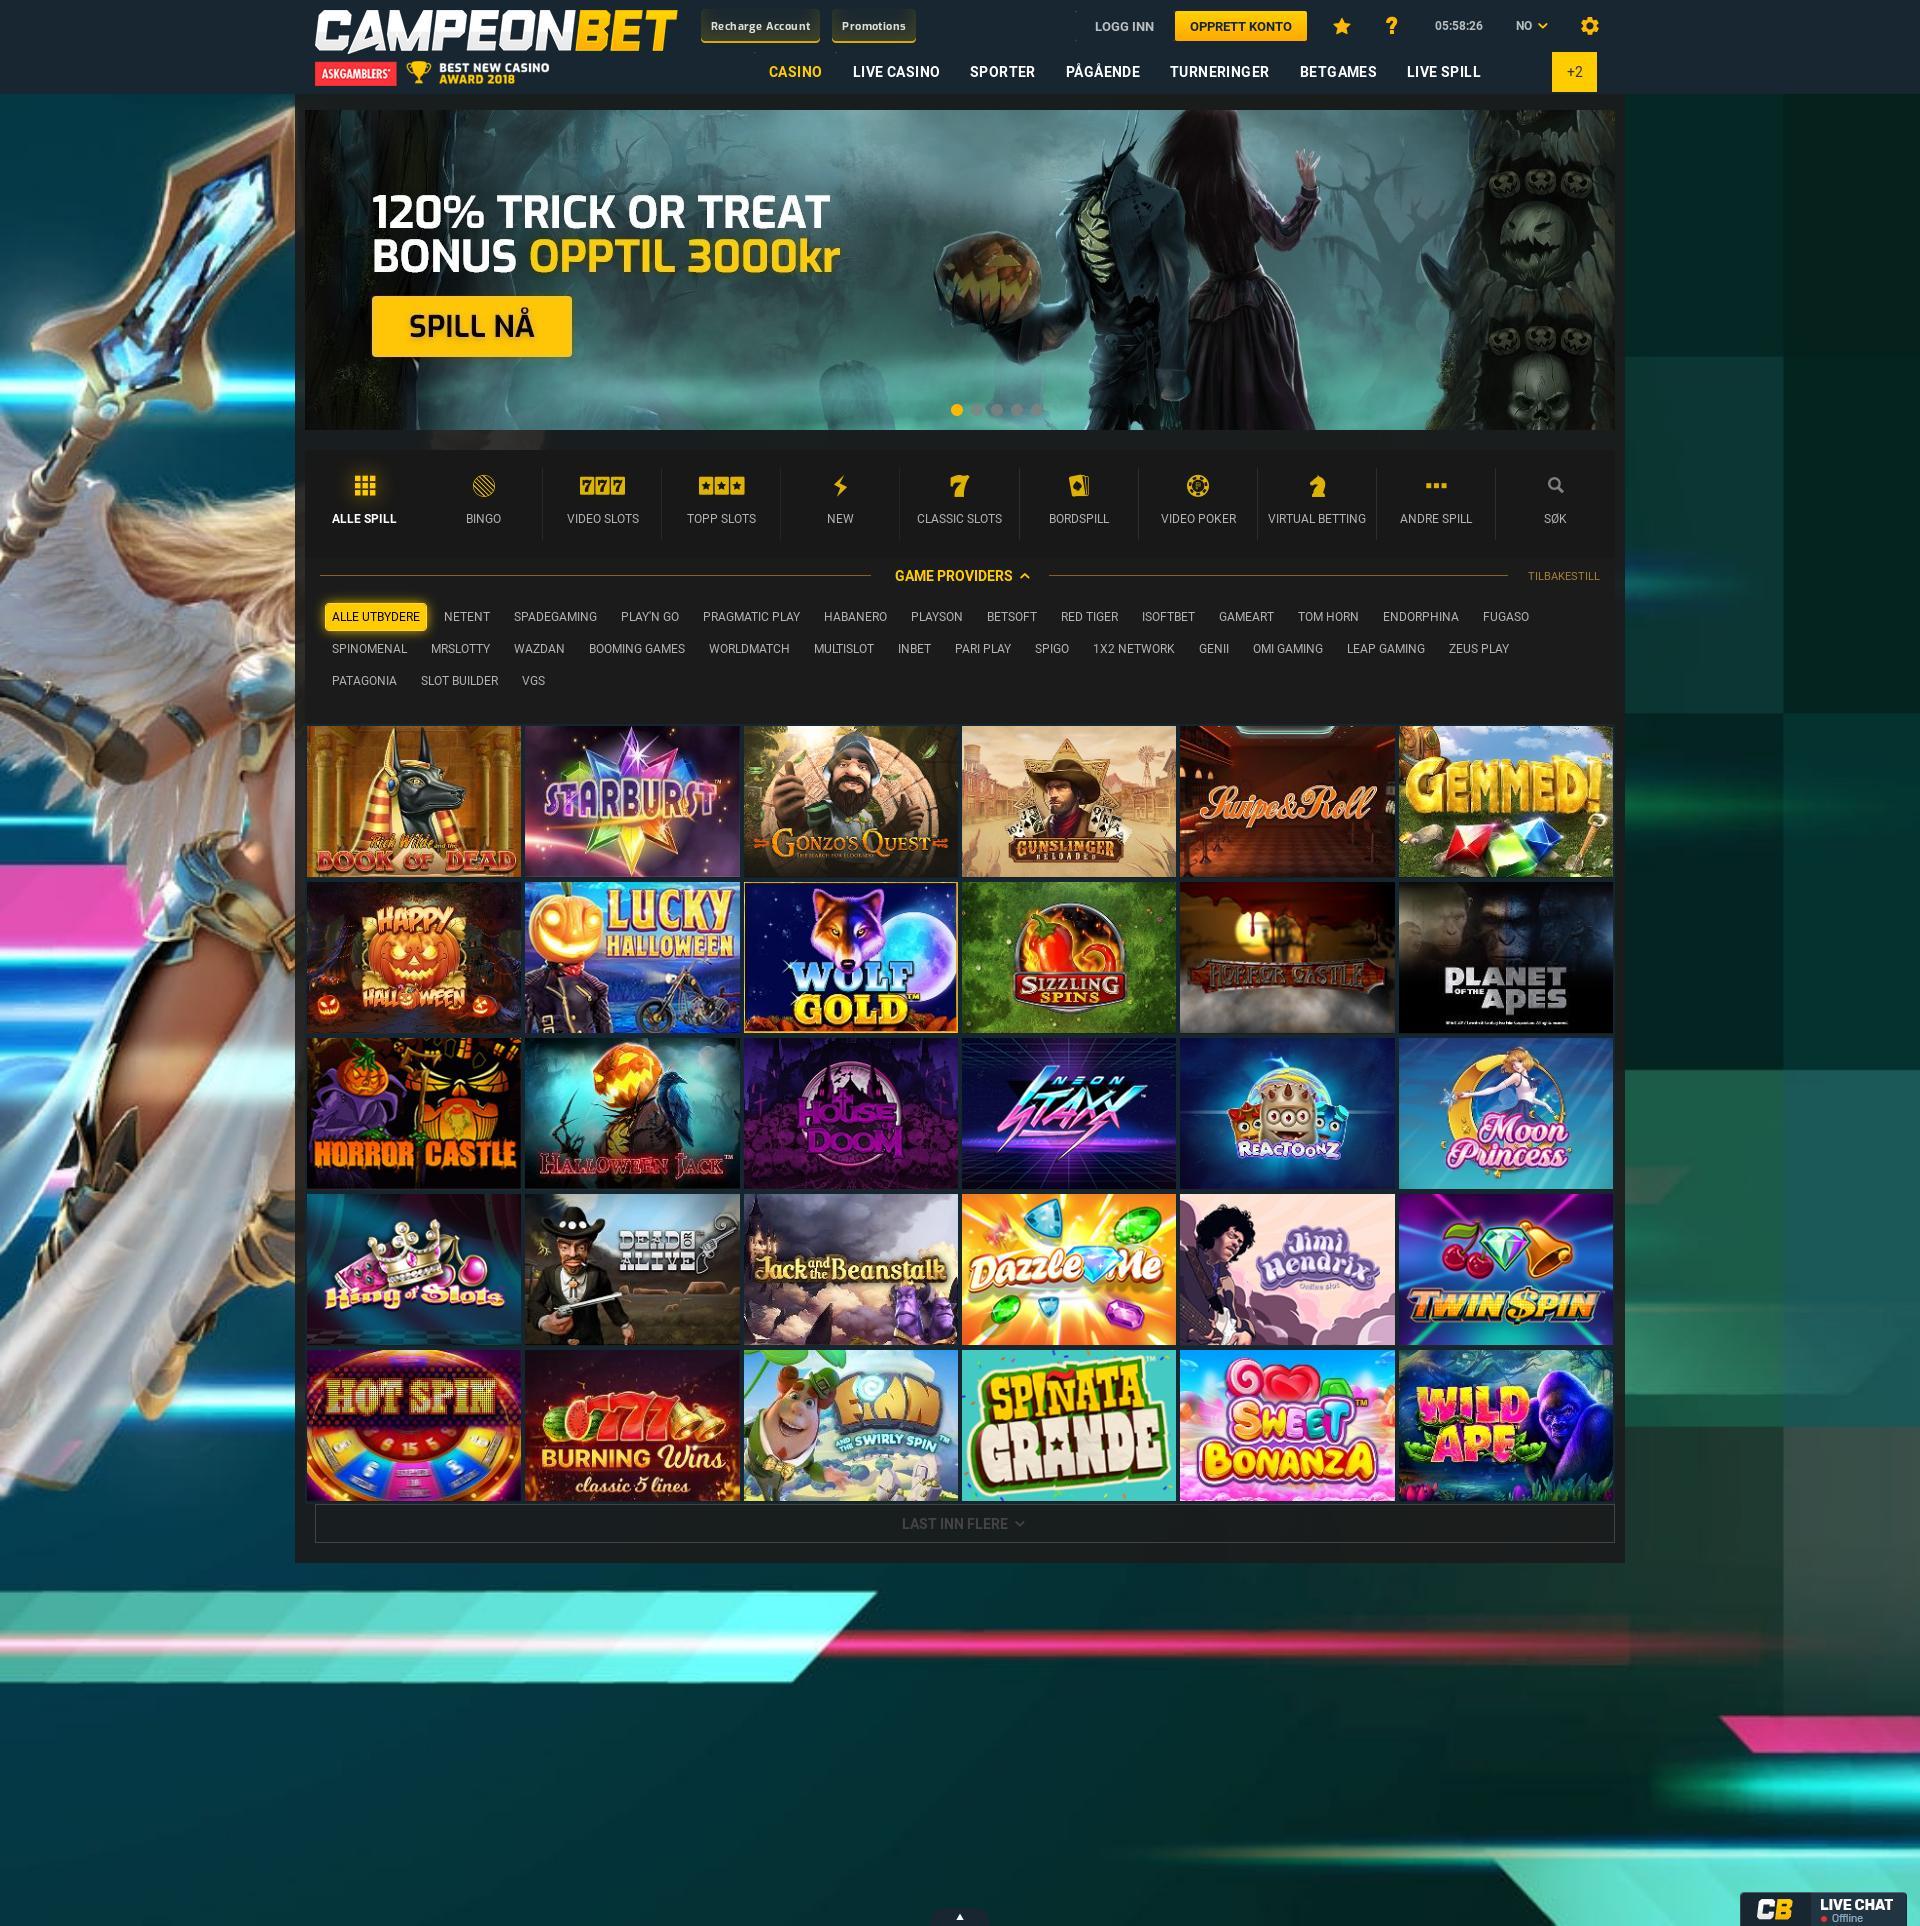 Casino screen Lobby 2019-10-21 for Norway